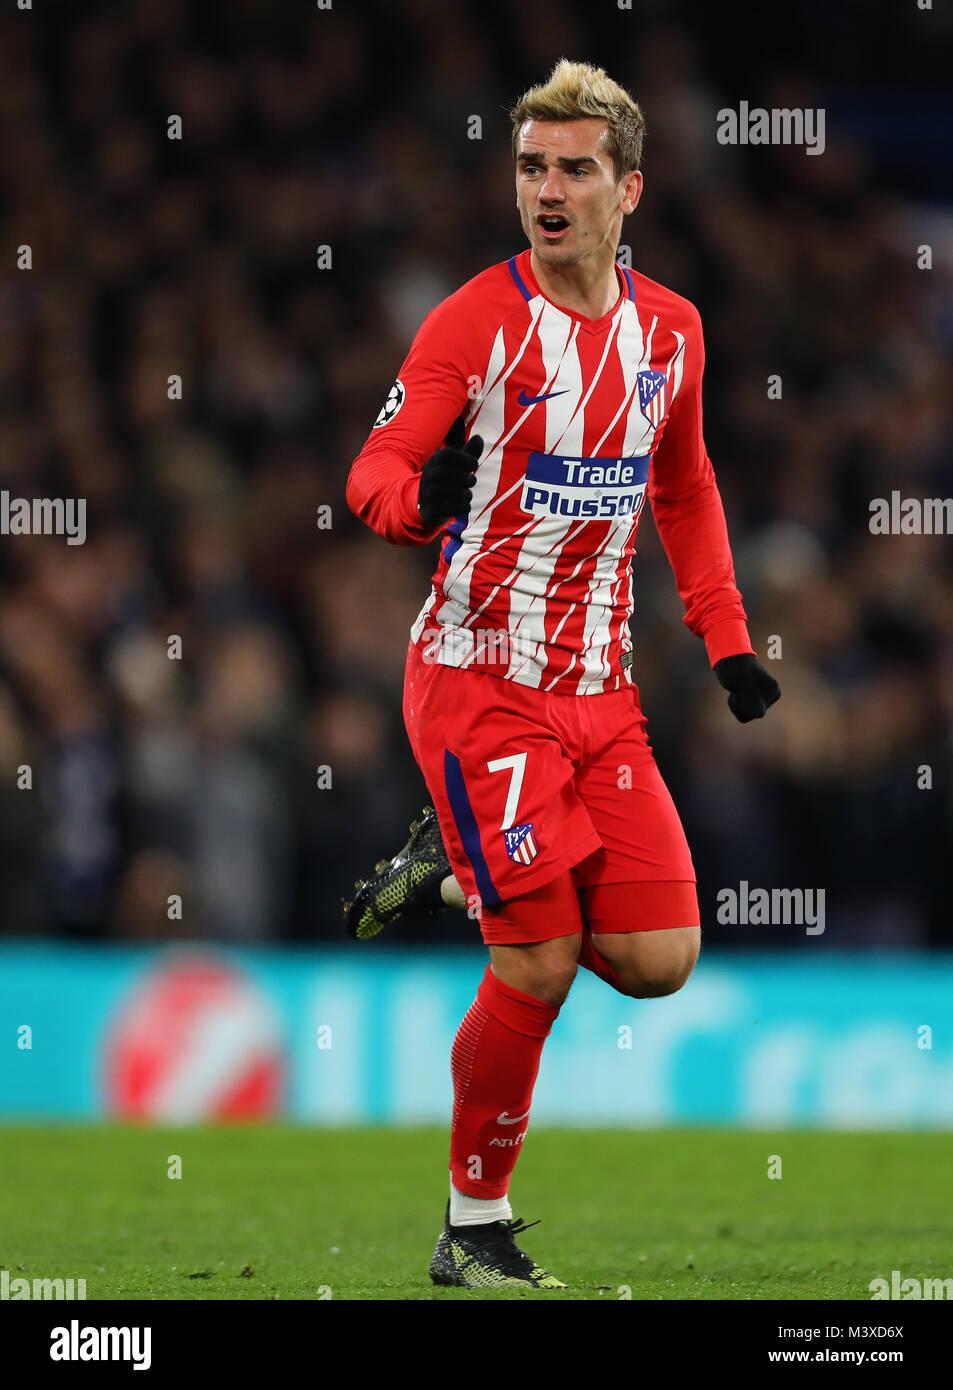 Antoine Griezmann von Atletico Madrid - Chelsea v Atletico Madrid, UEFA  Champions League, Stamford Bridge, London, 5. Dezember 2017 Stockfotografie  - Alamy